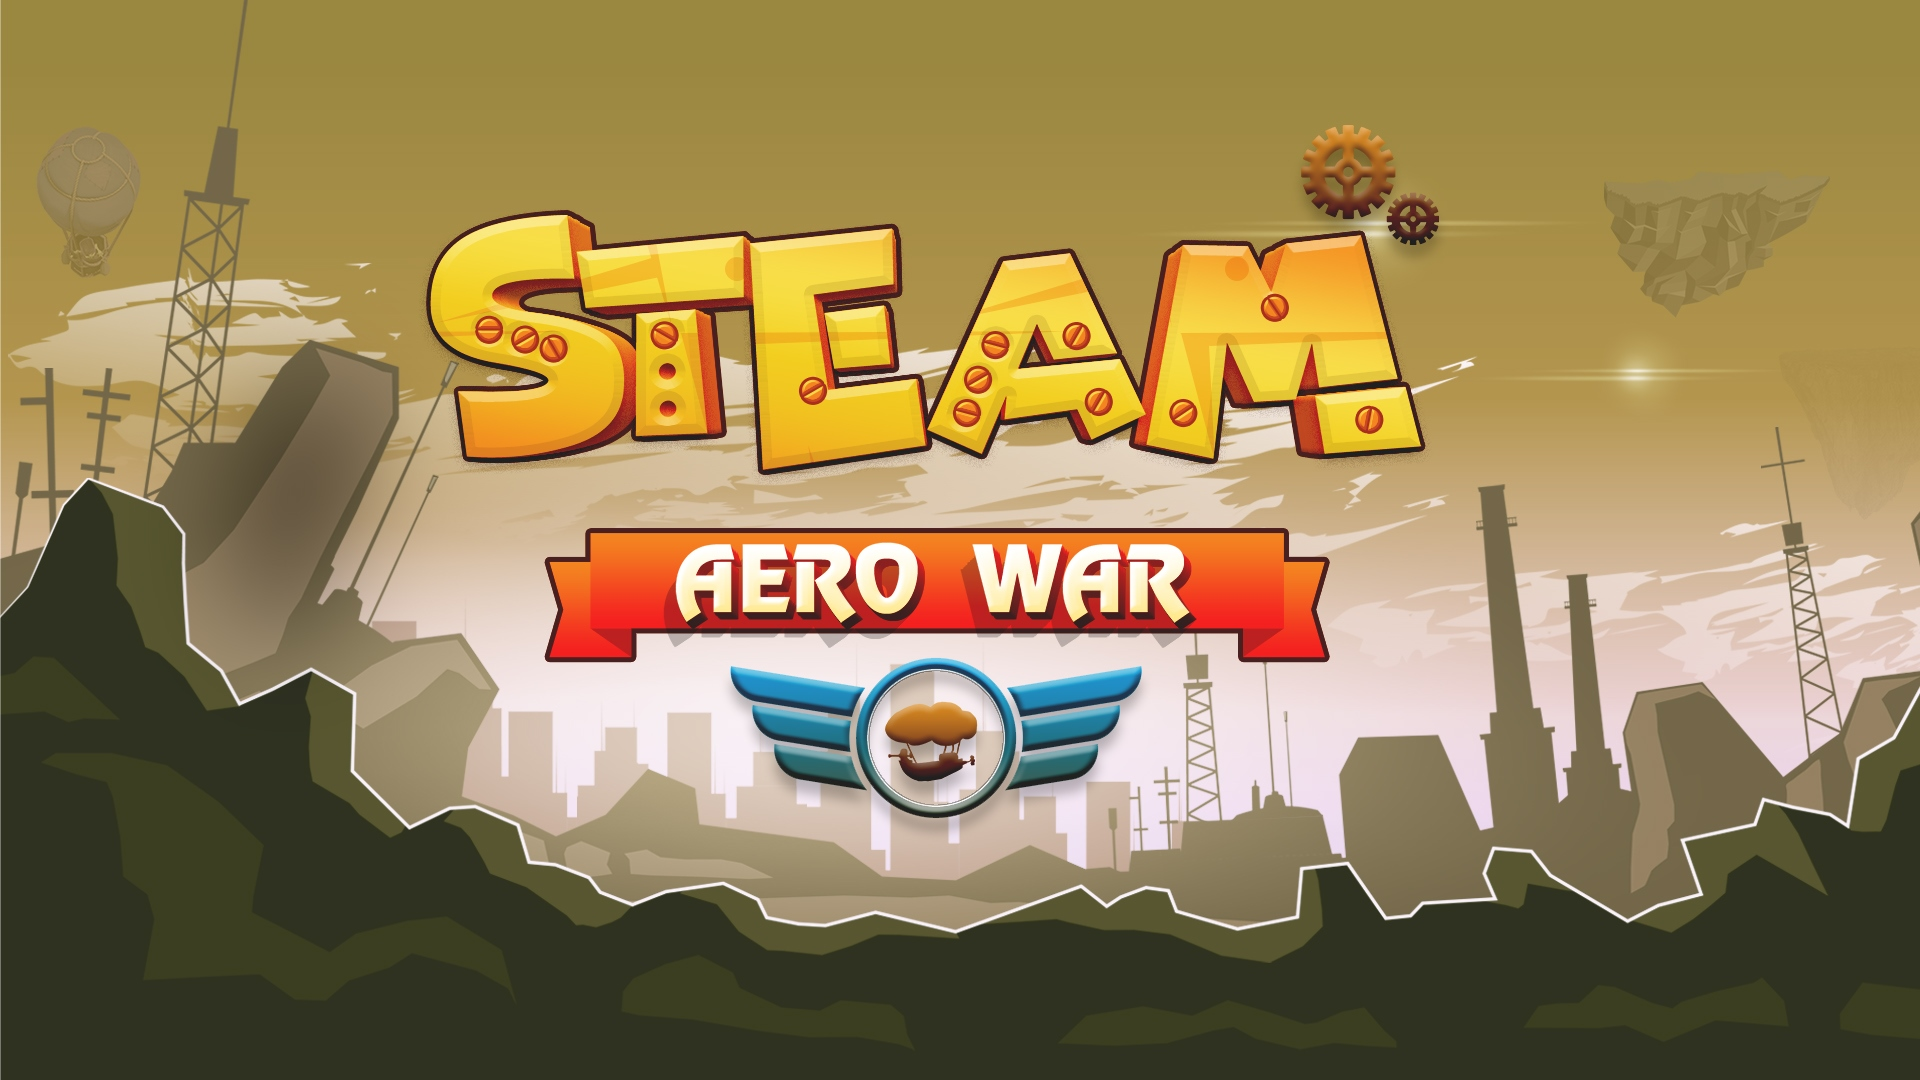 Steame aero war